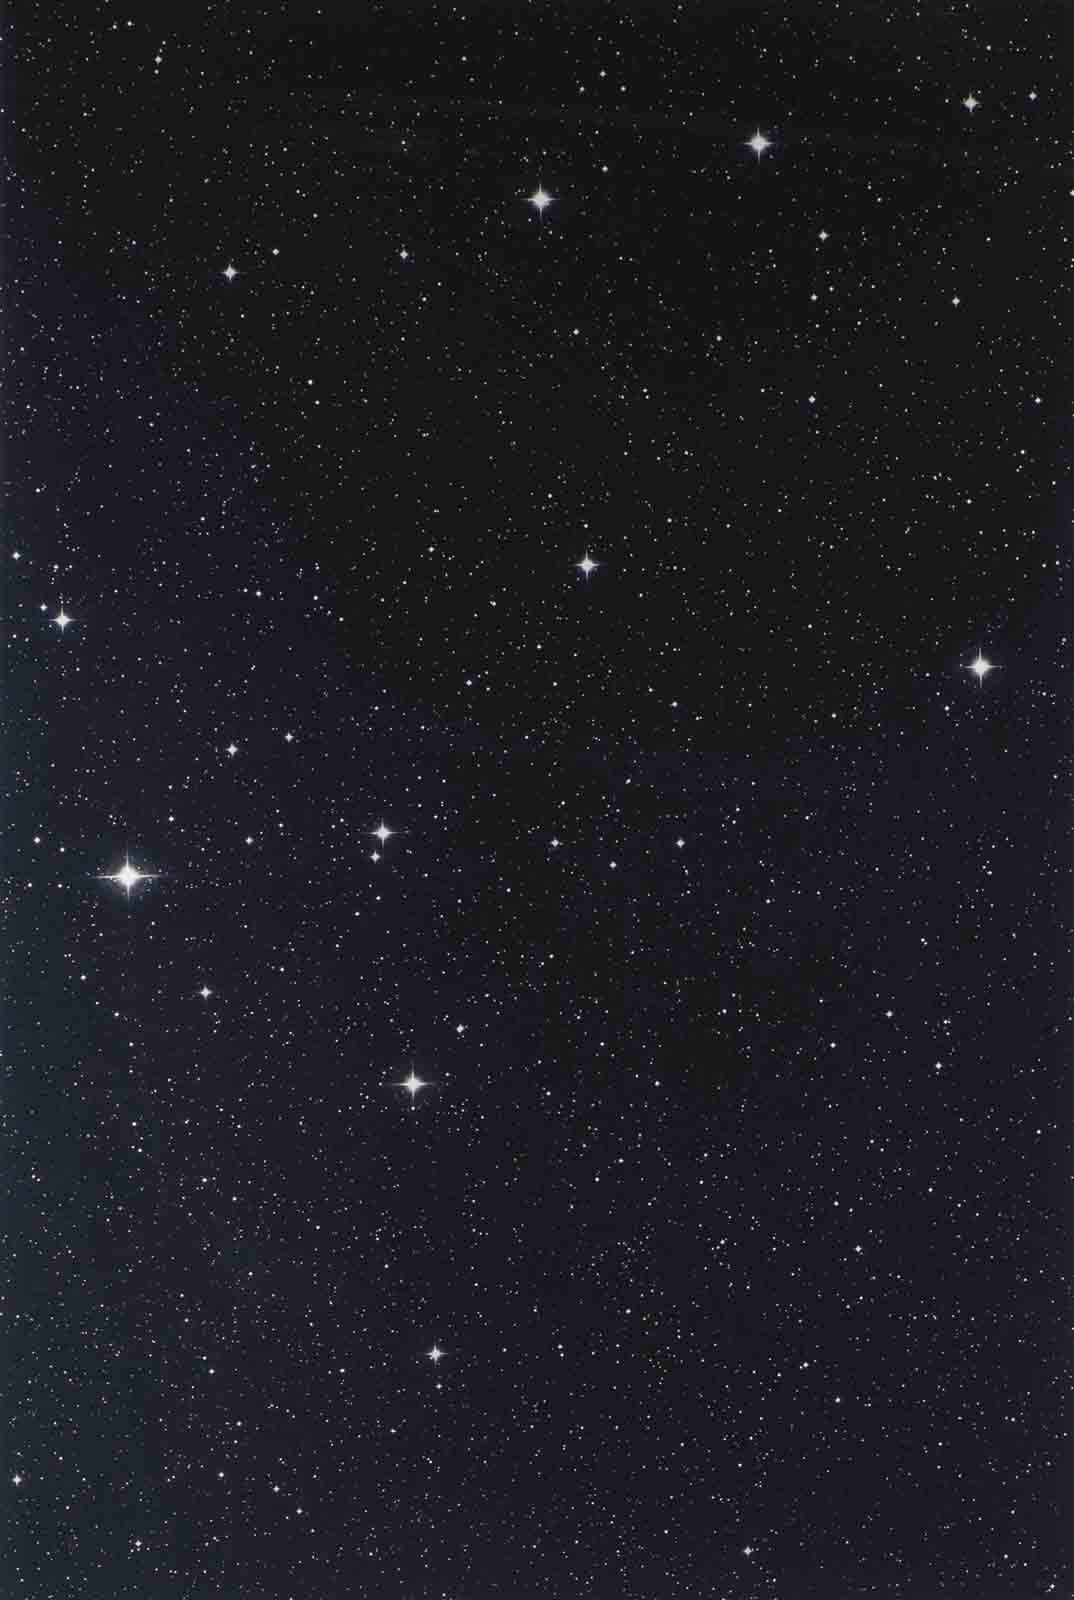 Sterne 02h 56m -65°